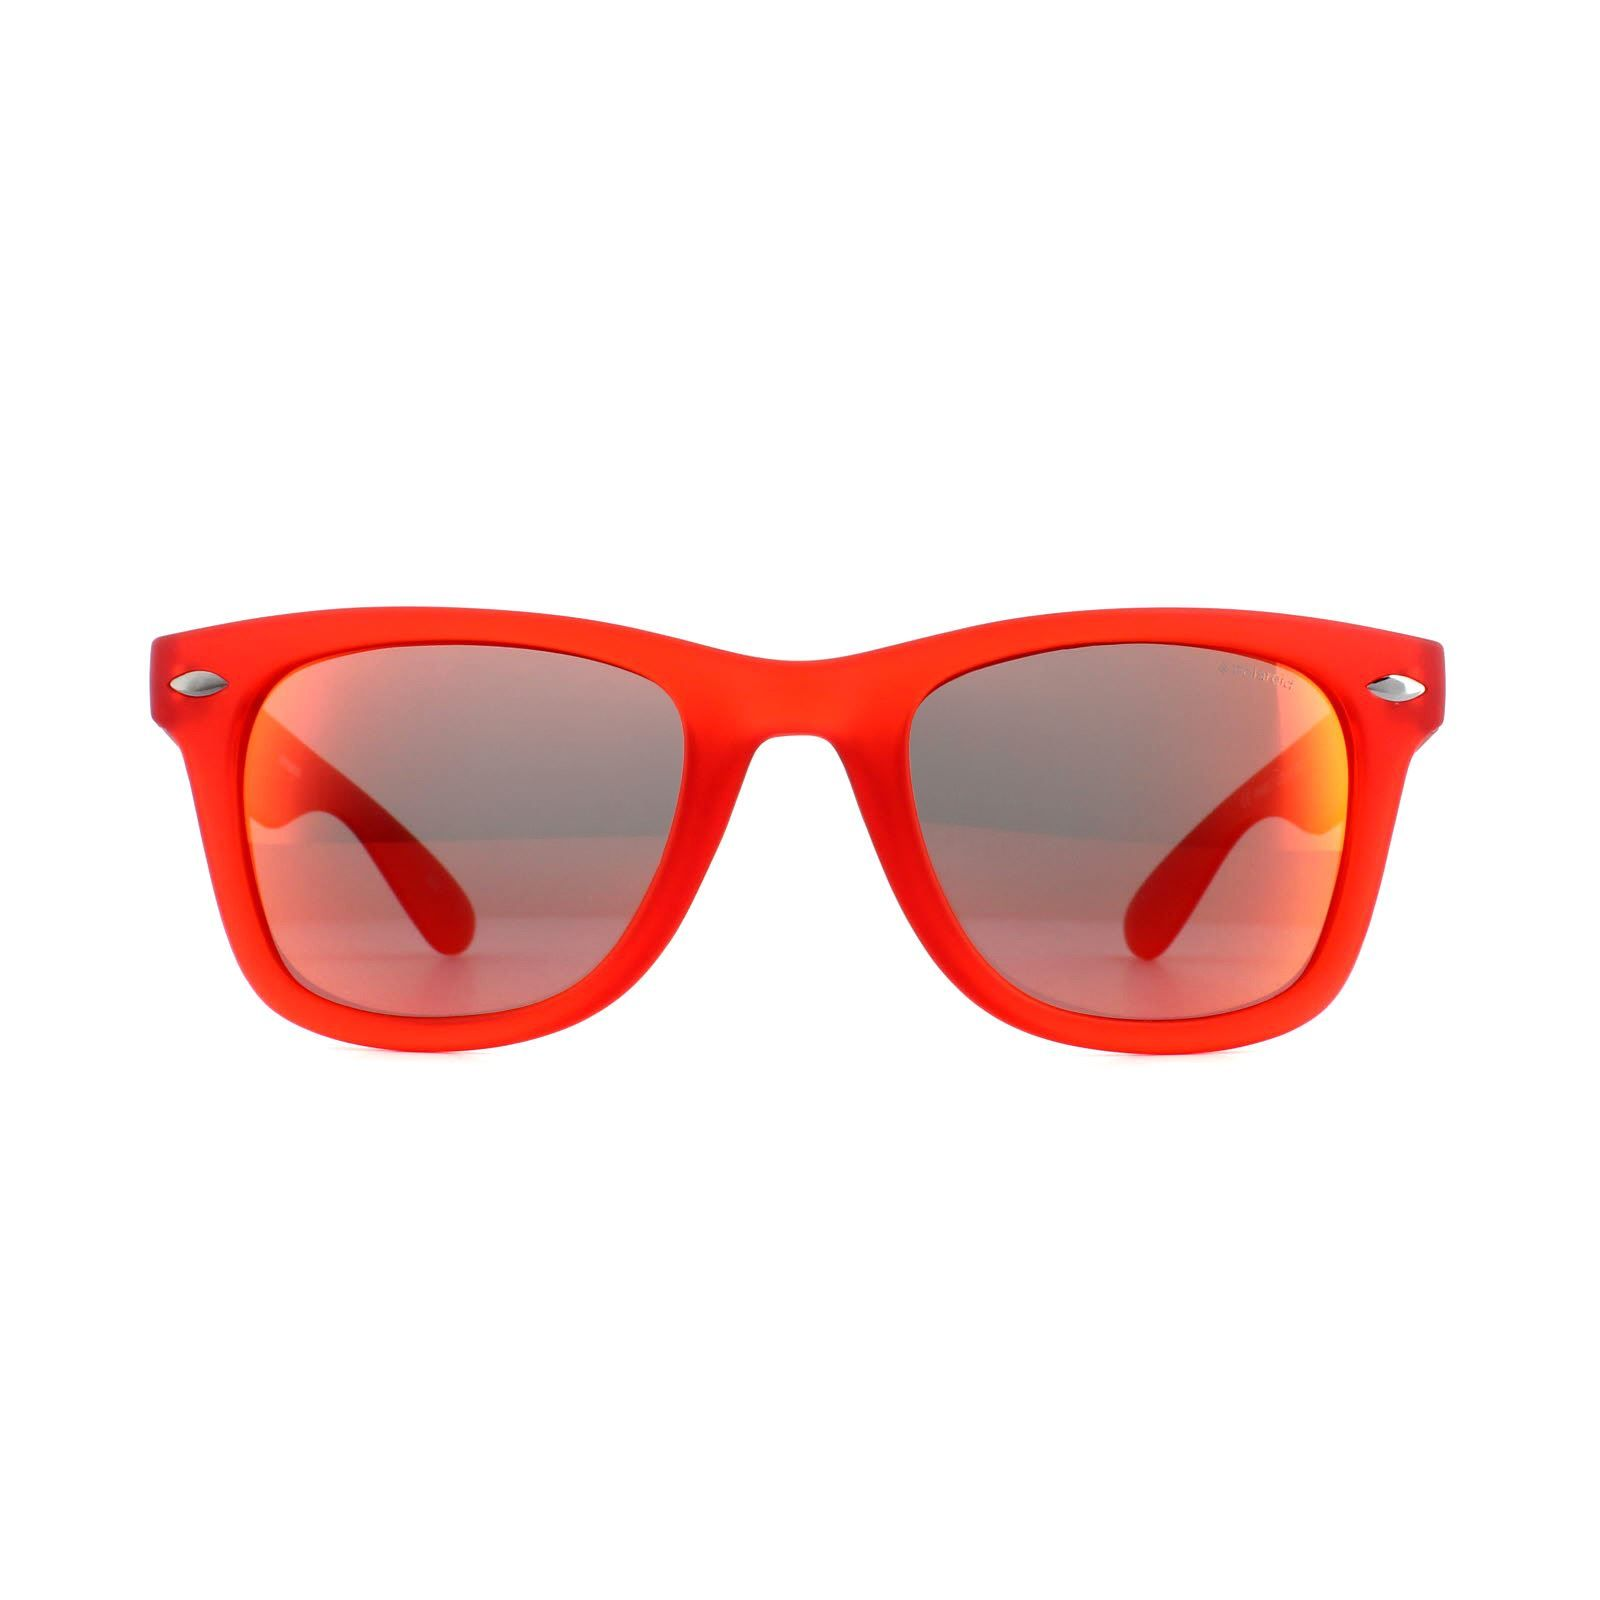 Polaroid Sunglasses PLD P8400 0Z3 Red Red Mirror Polarized